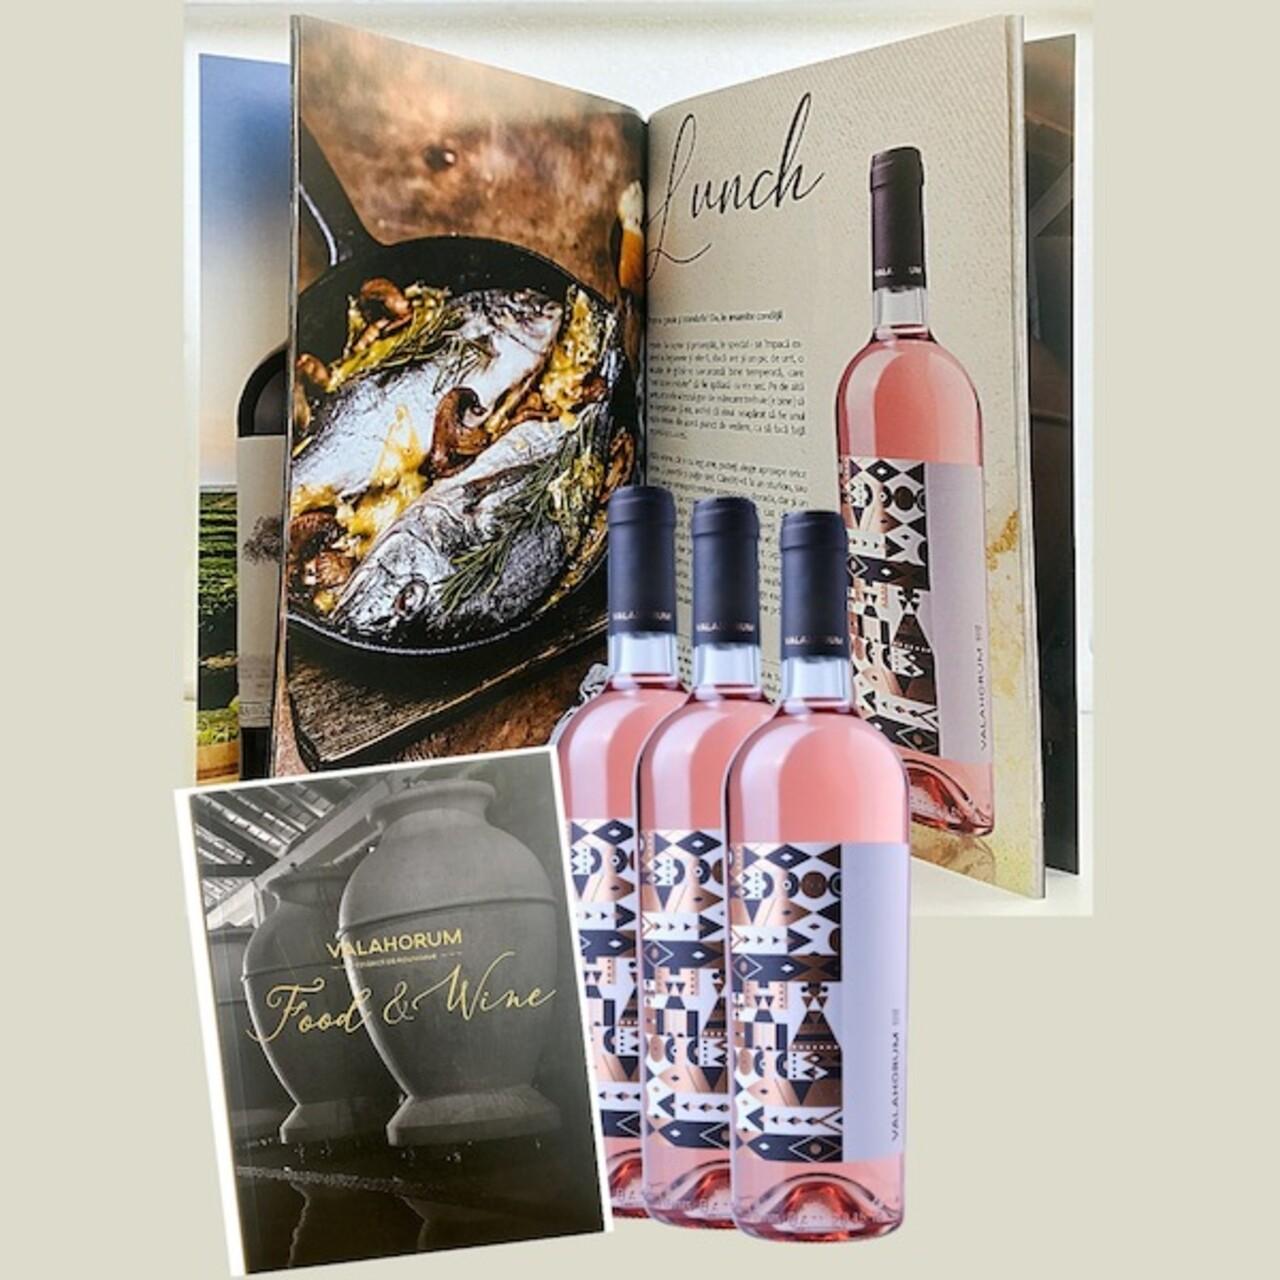 Pachet 3 st. Valahorum Rose Busuioaca de Bohotin + Catalog Food&Wine de asocieri